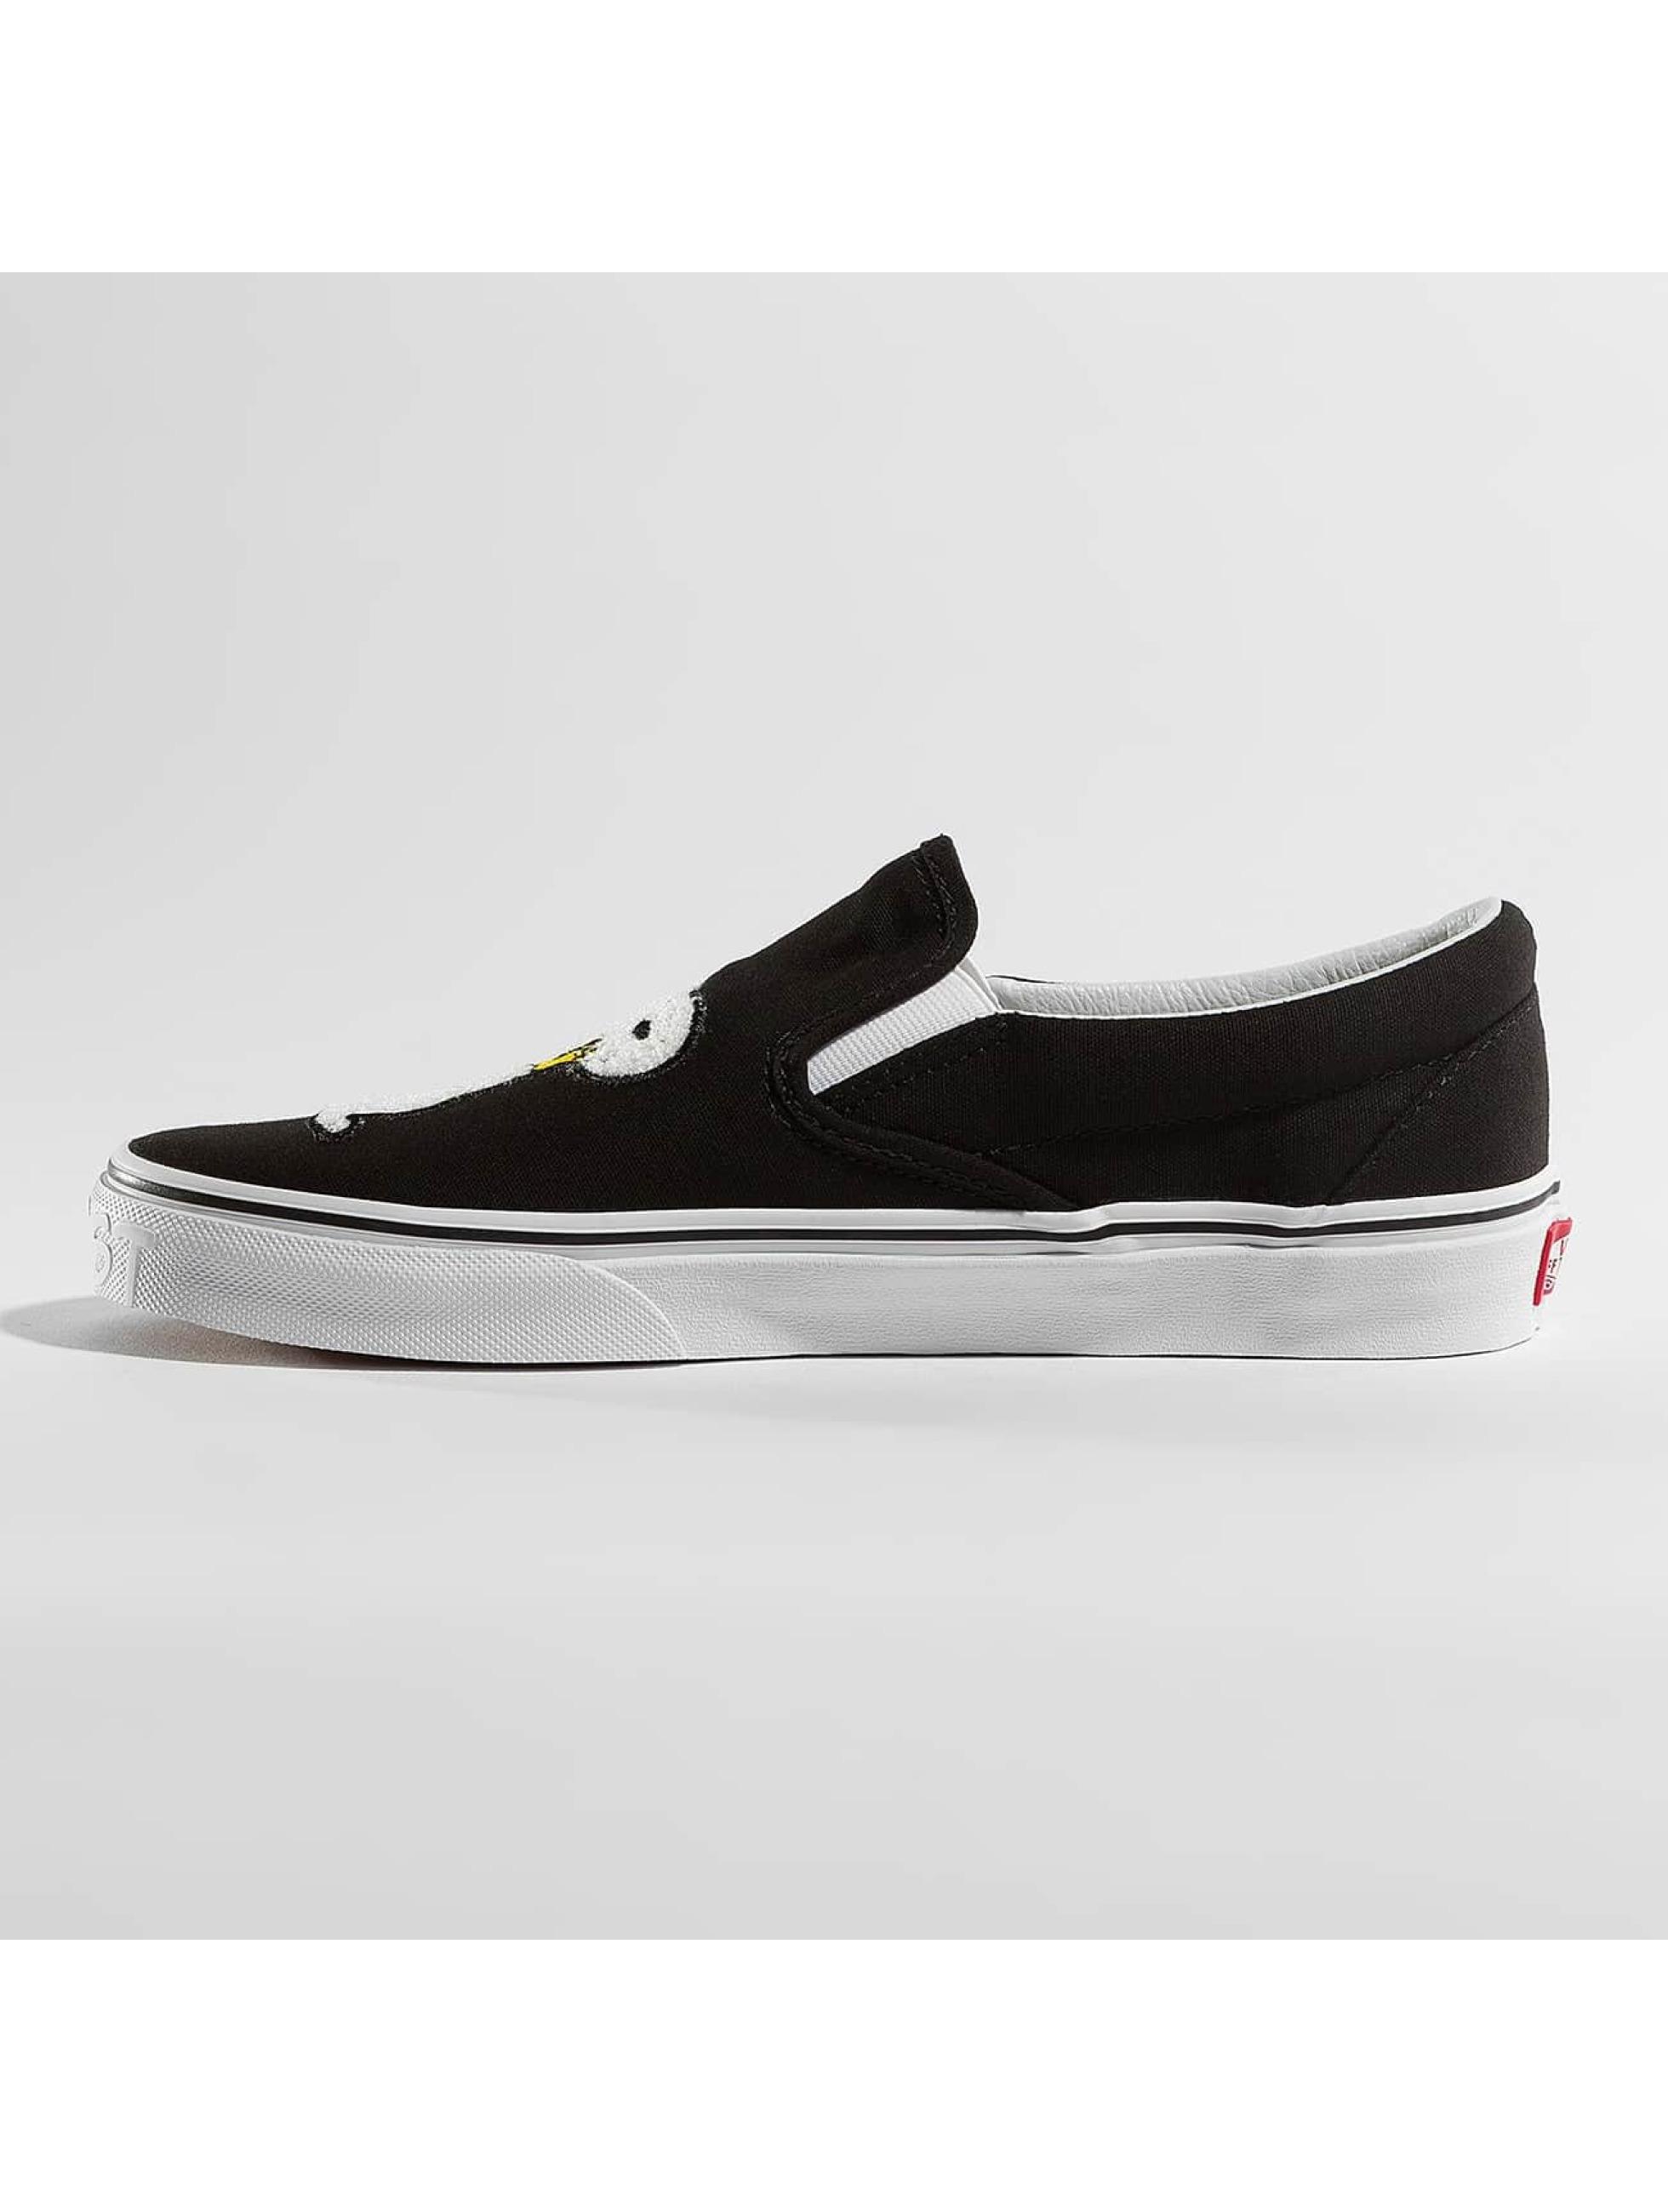 Vans Zapatillas de deporte Peanuts Classic Slip On negro